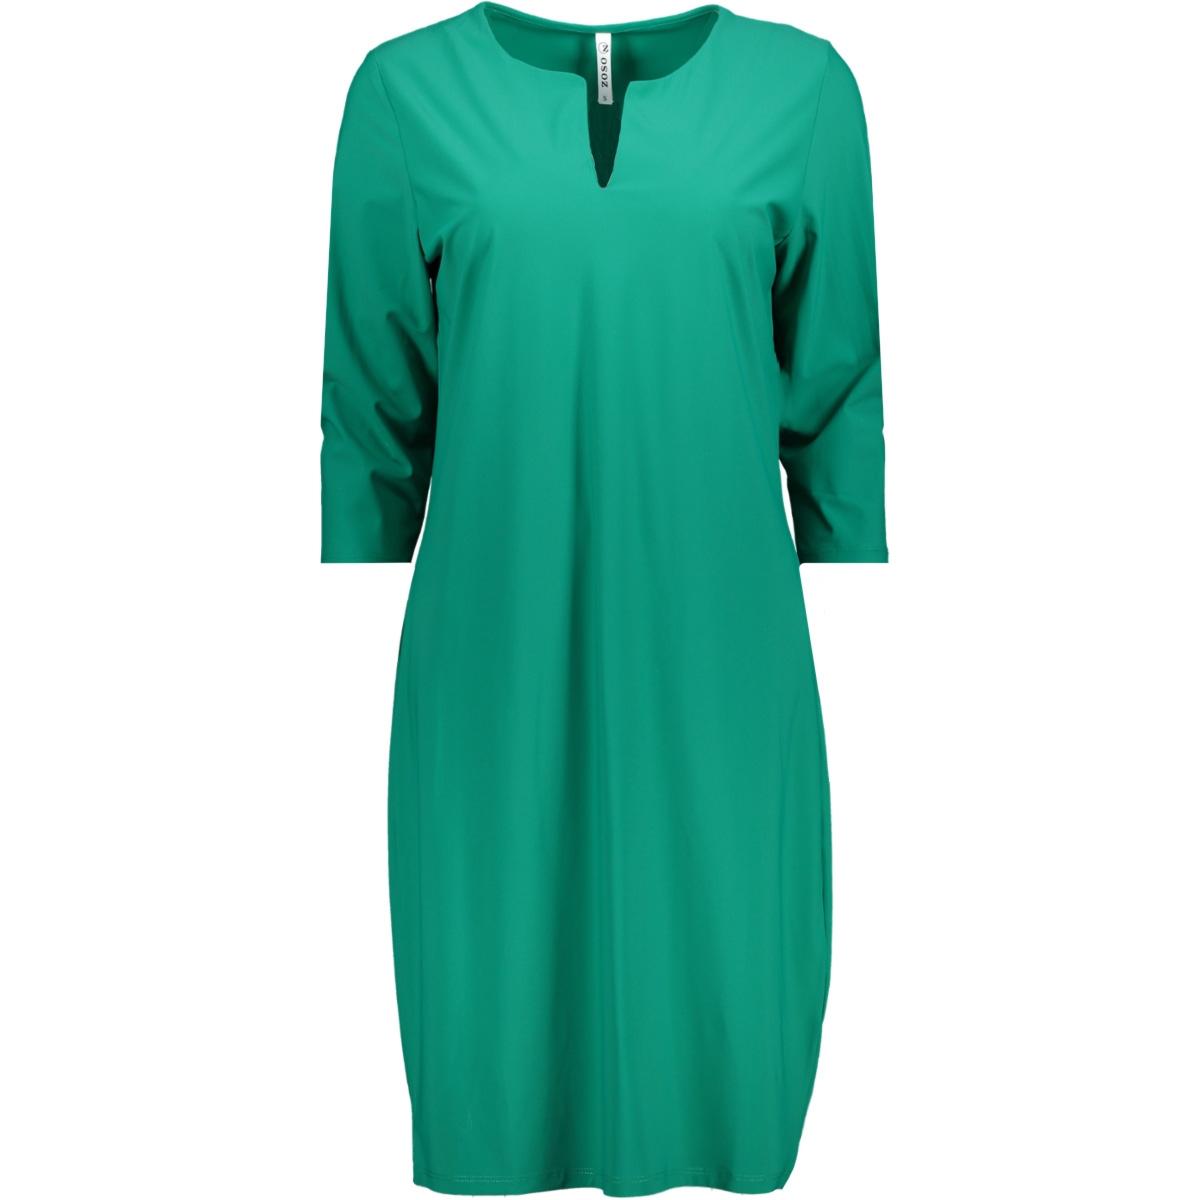 manon travel dress zoso jurk green